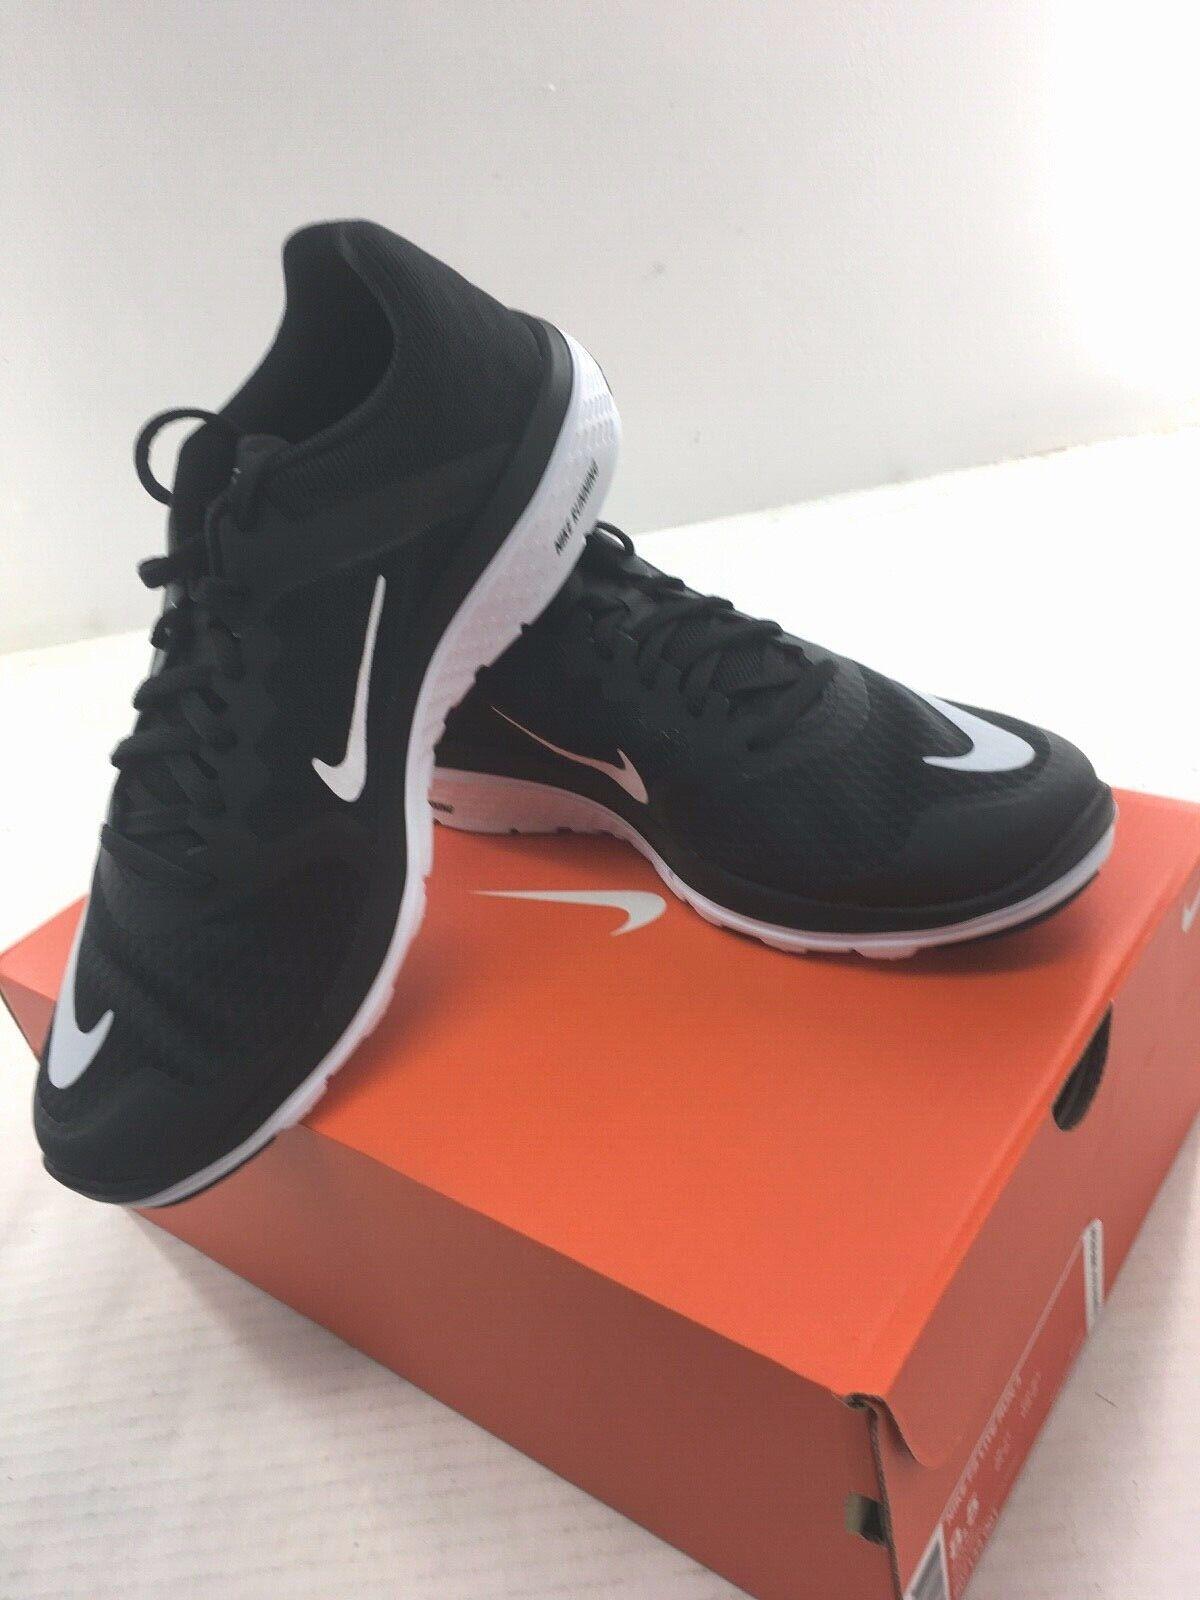 612d476b Nike FS Lite Run 2 Mens 685266-060 Black Red Athletic Running Shoes Size 10  for sale online | eBay